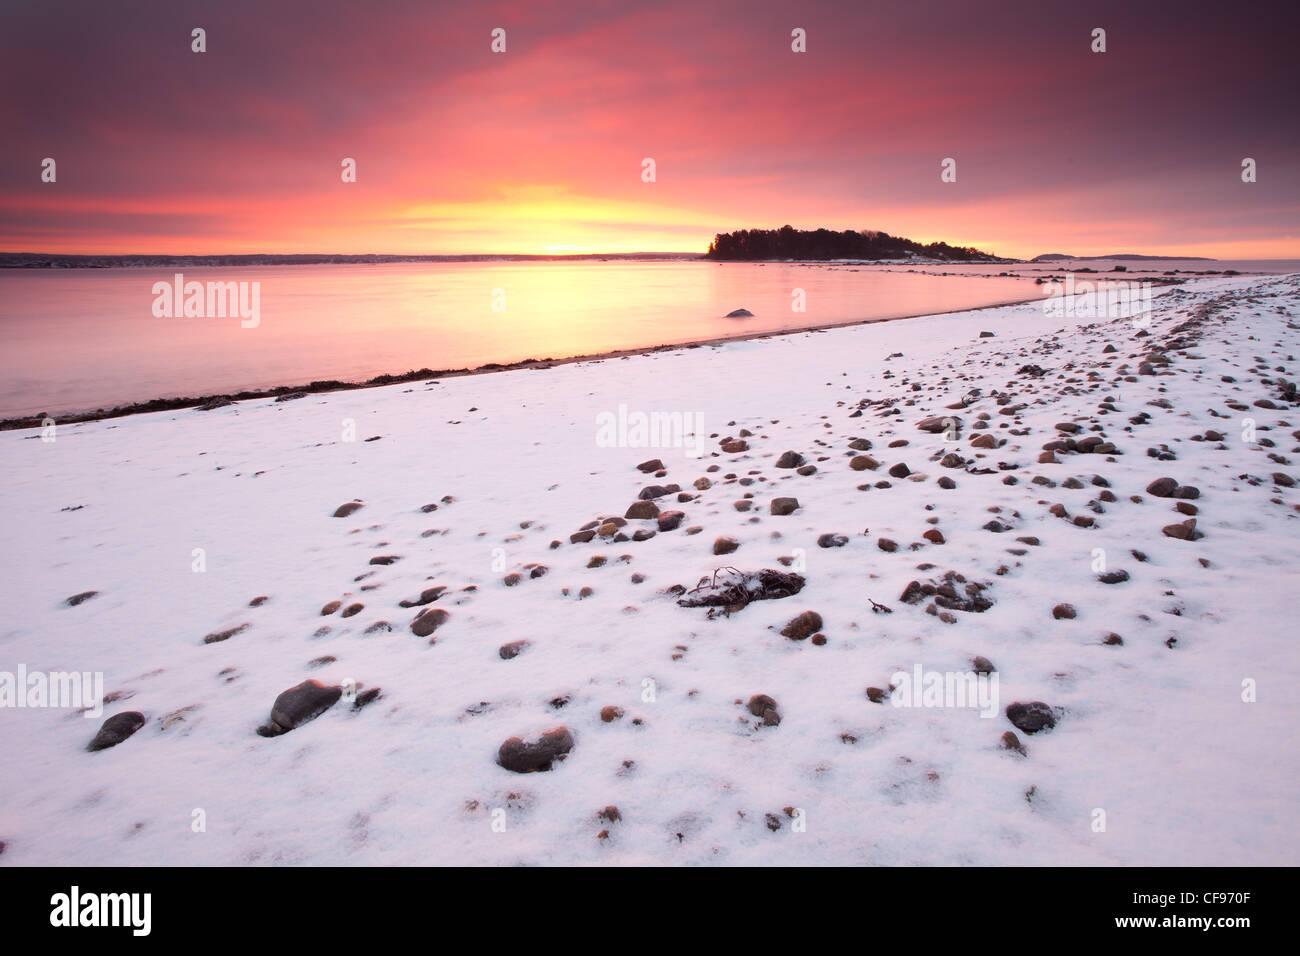 Inverno mattina a Larkollen in Rygge, Østfold fylke, Norvegia. Immagini Stock